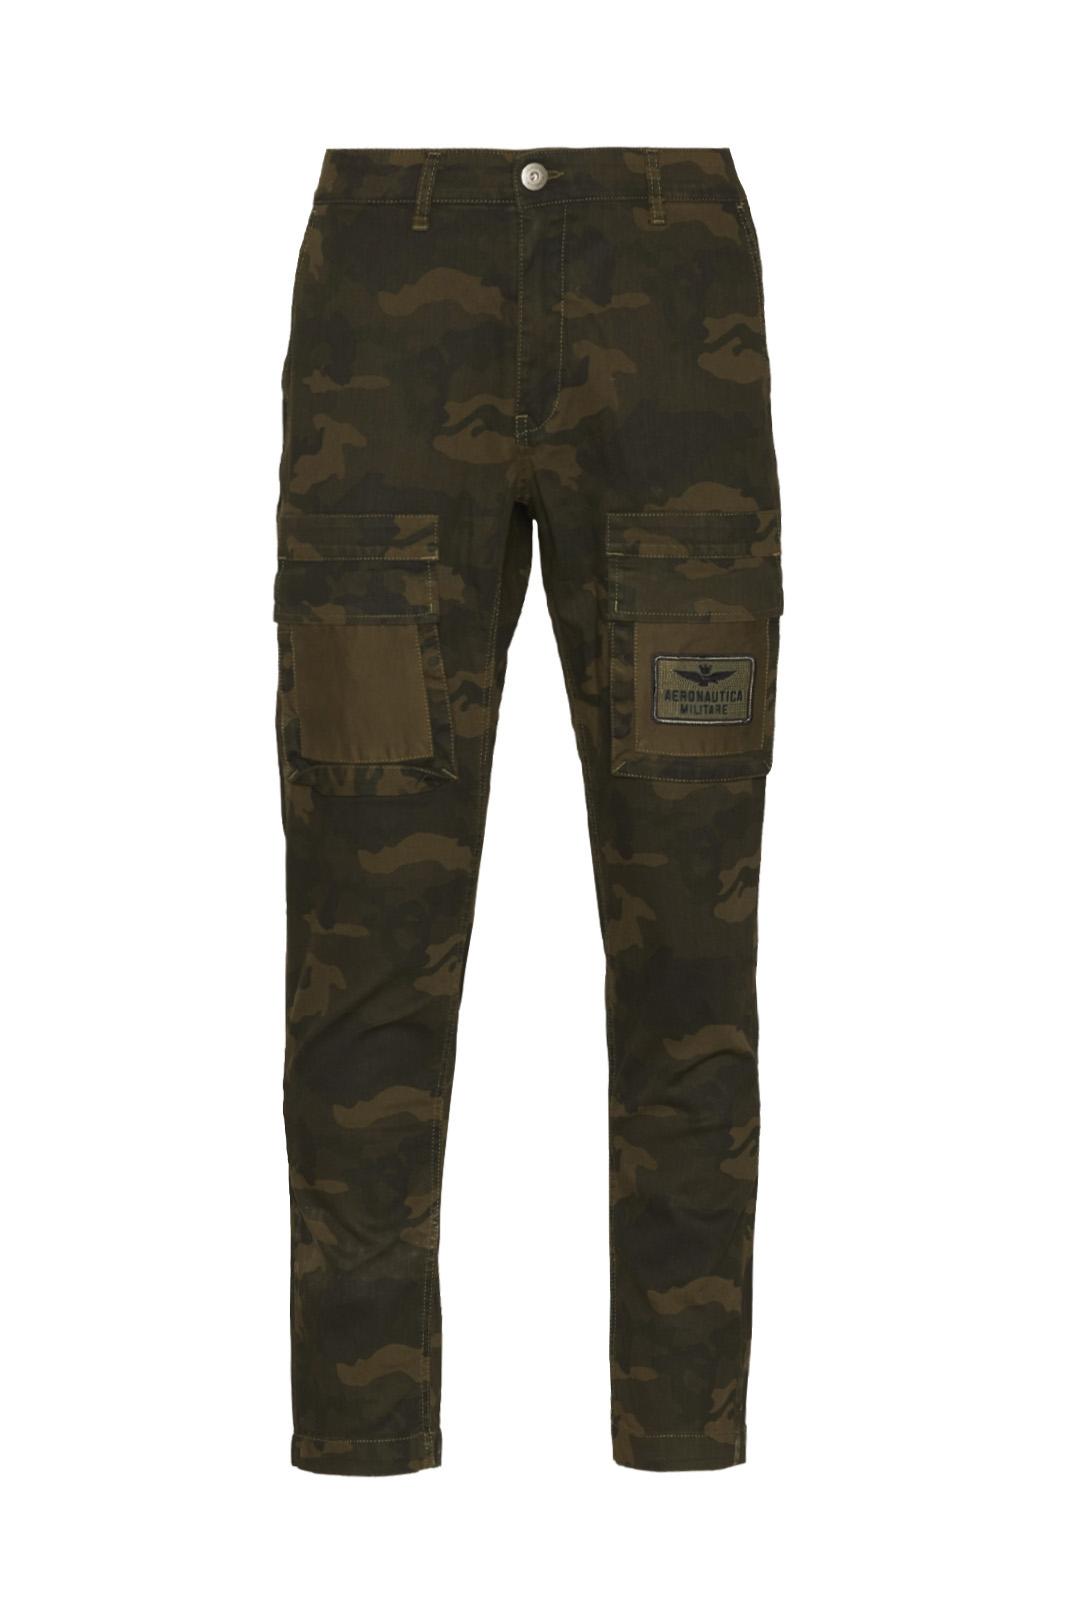 Pantalon multipoches camouflge